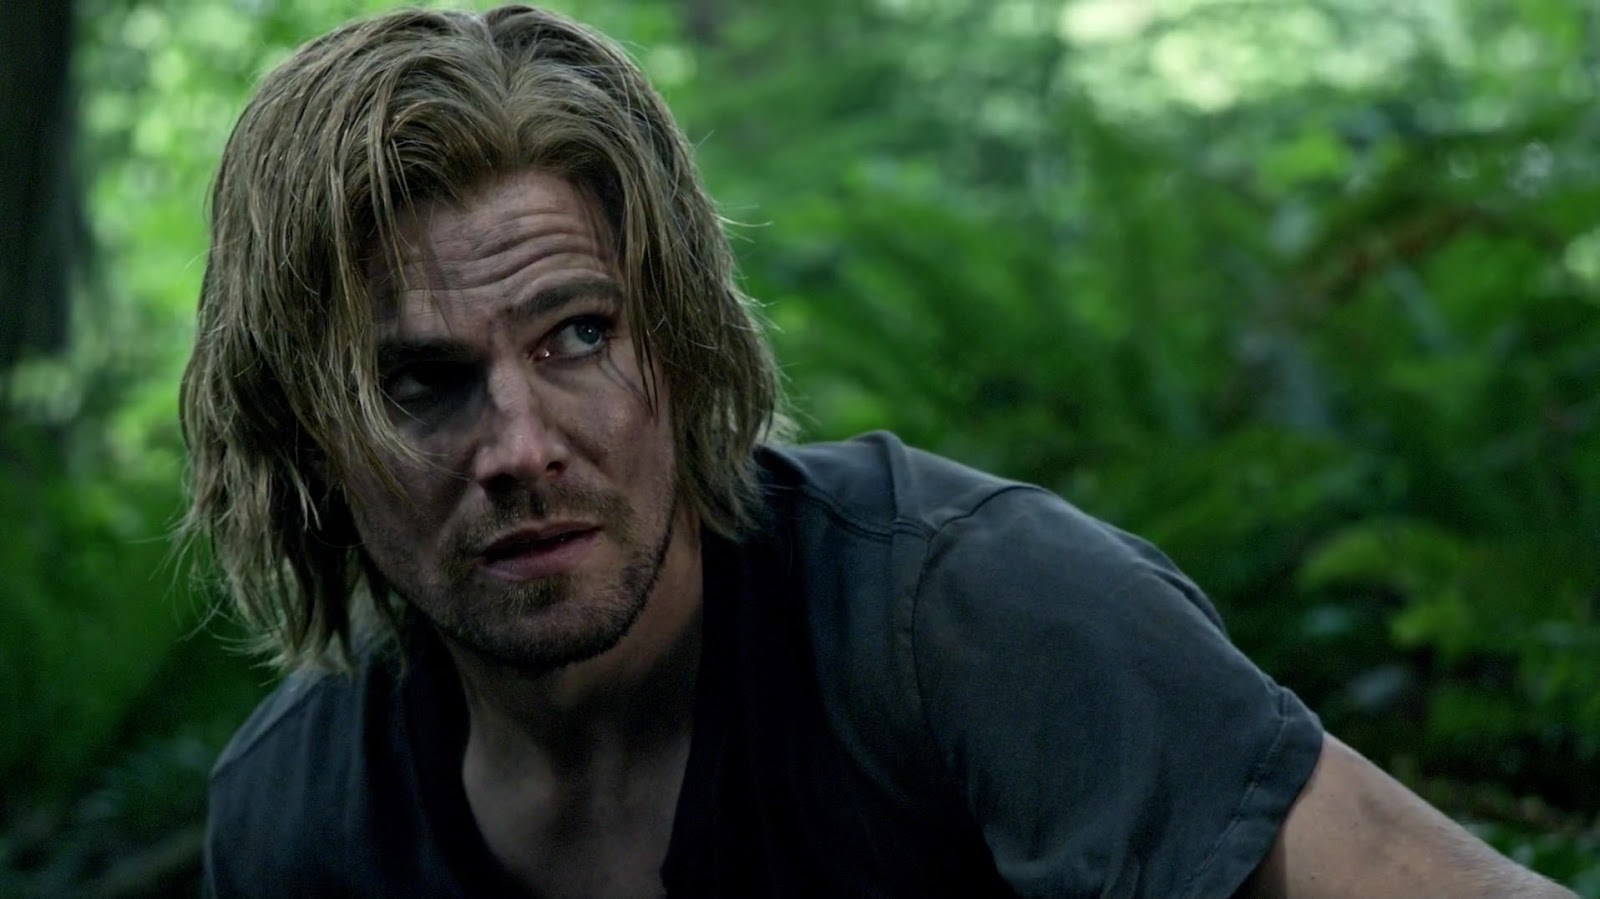 'Arrow': No More Flashbacks After Season 5